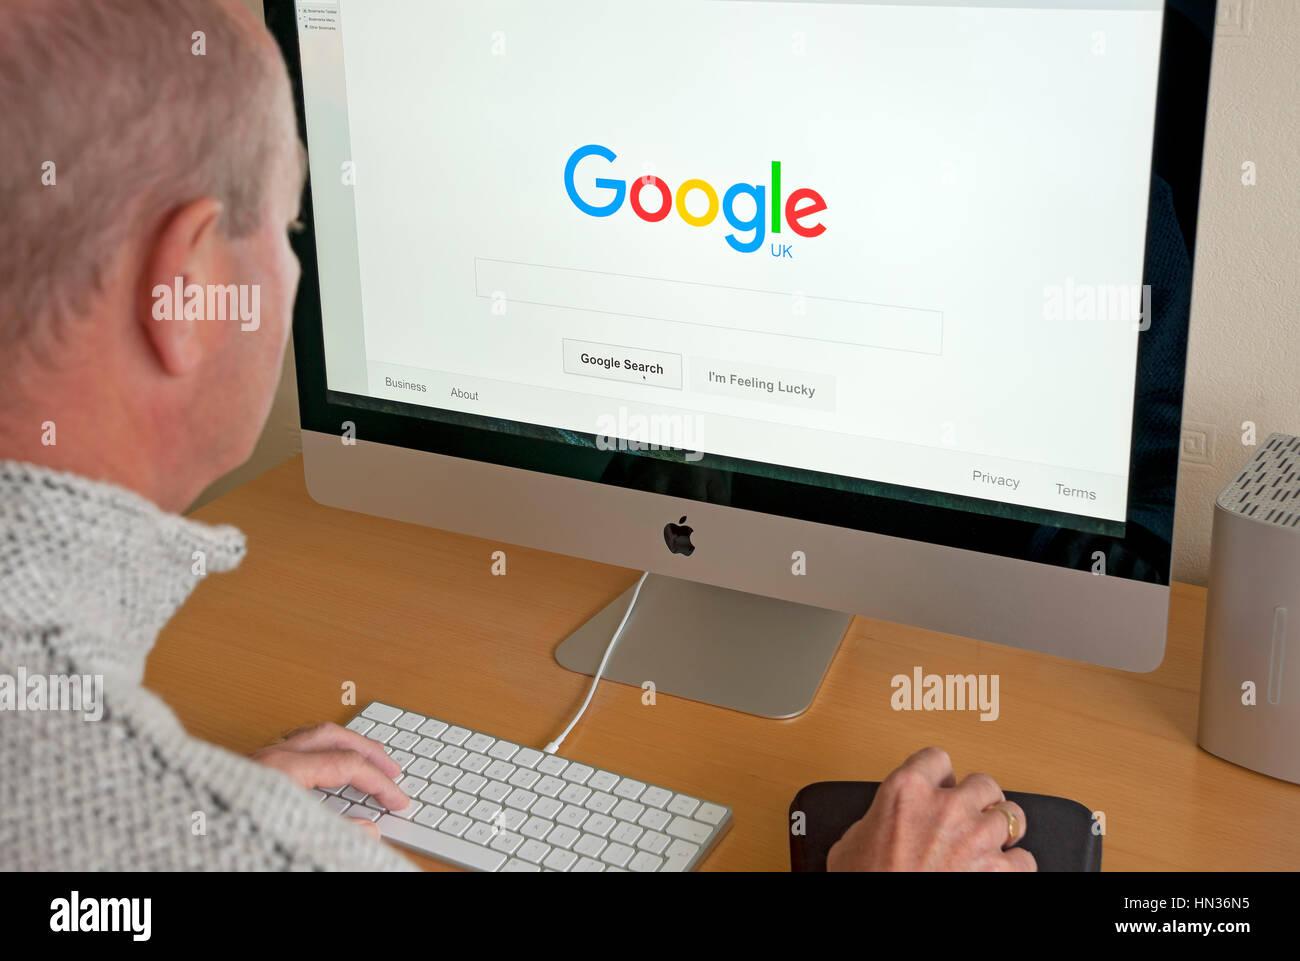 Man looking at Google UK homepage on computer screen. - Stock Image